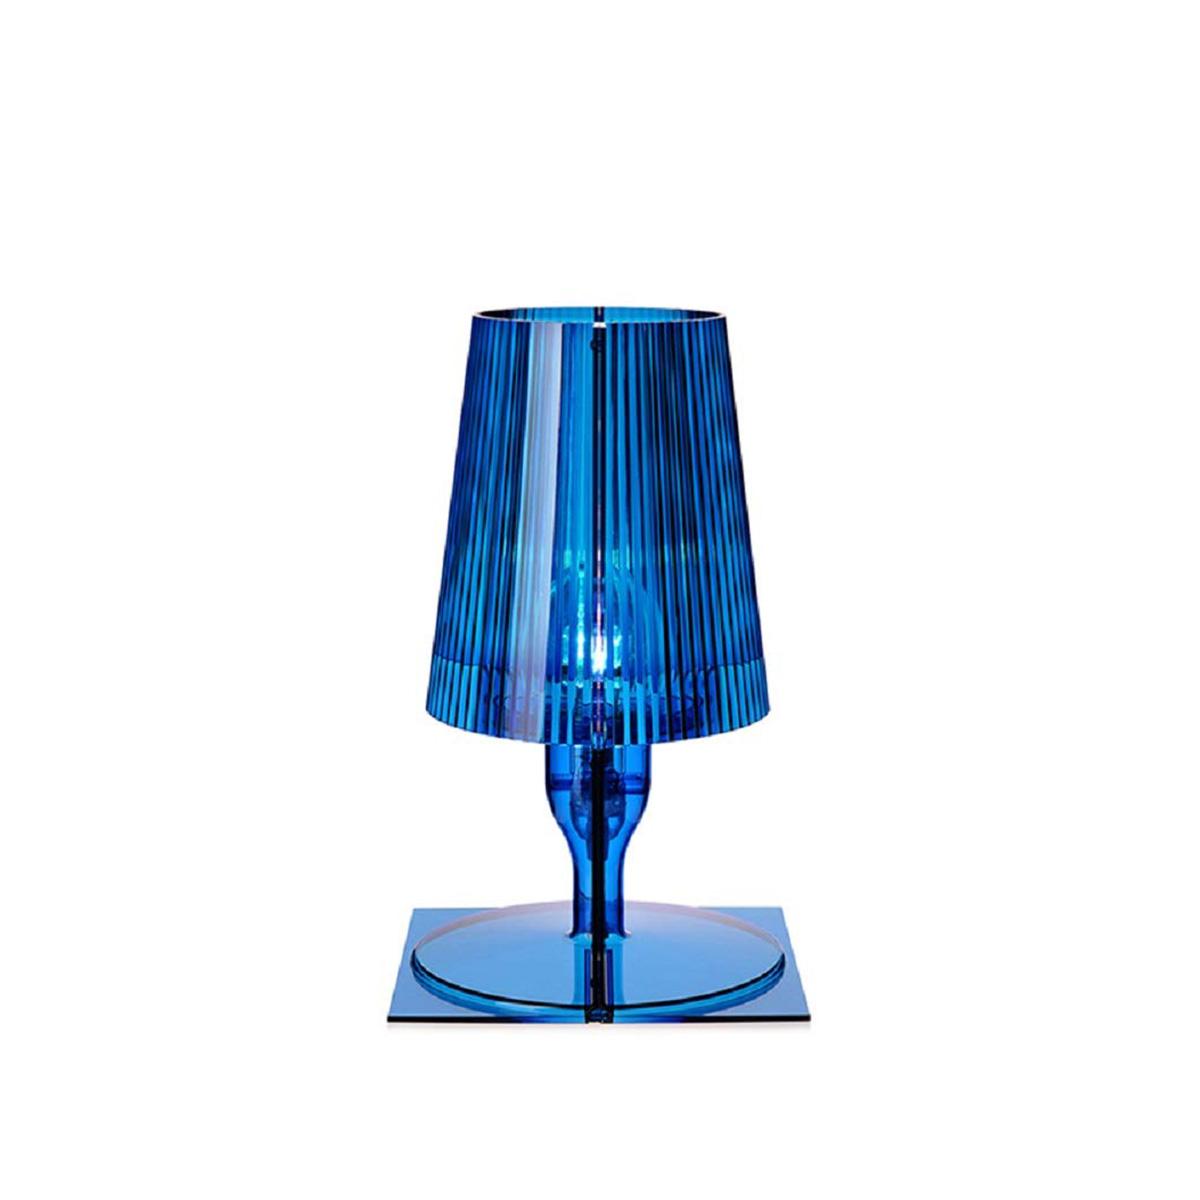 Stona lampa TAKE plava 9050/Q5